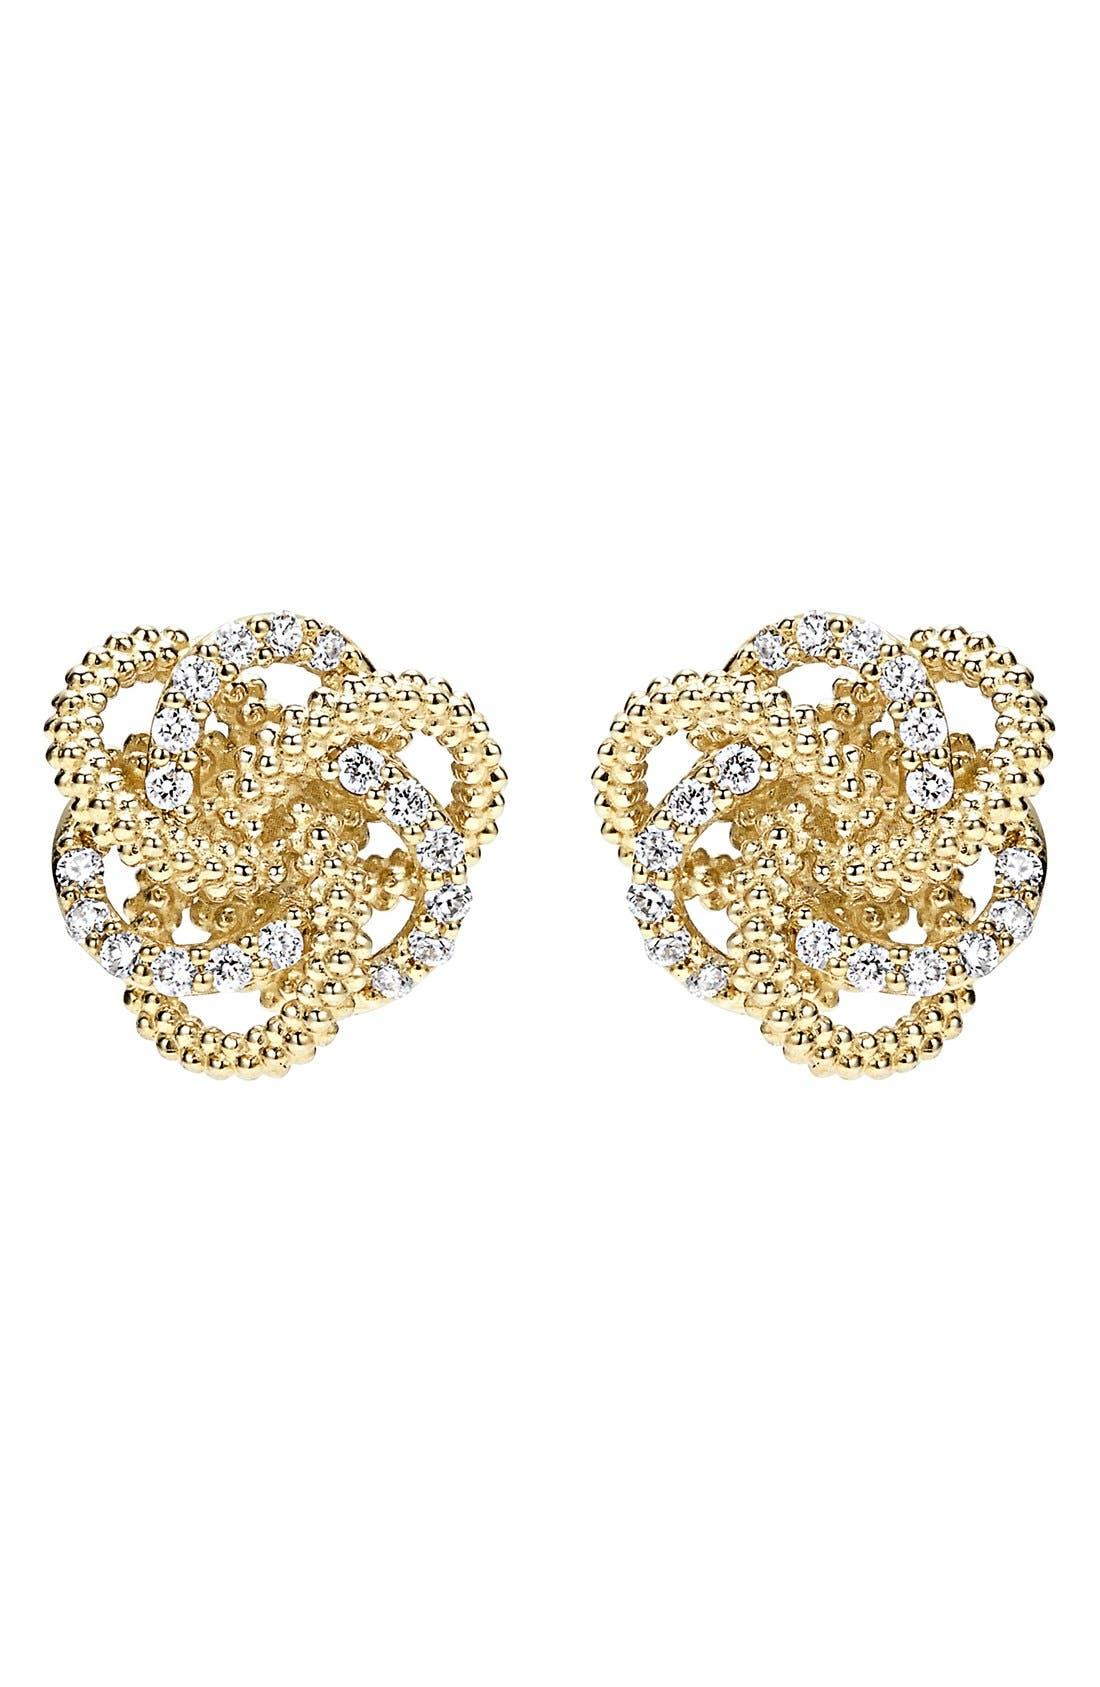 'Love Knot' Diamond Stud Earrings,                             Alternate thumbnail 2, color,                             Gold